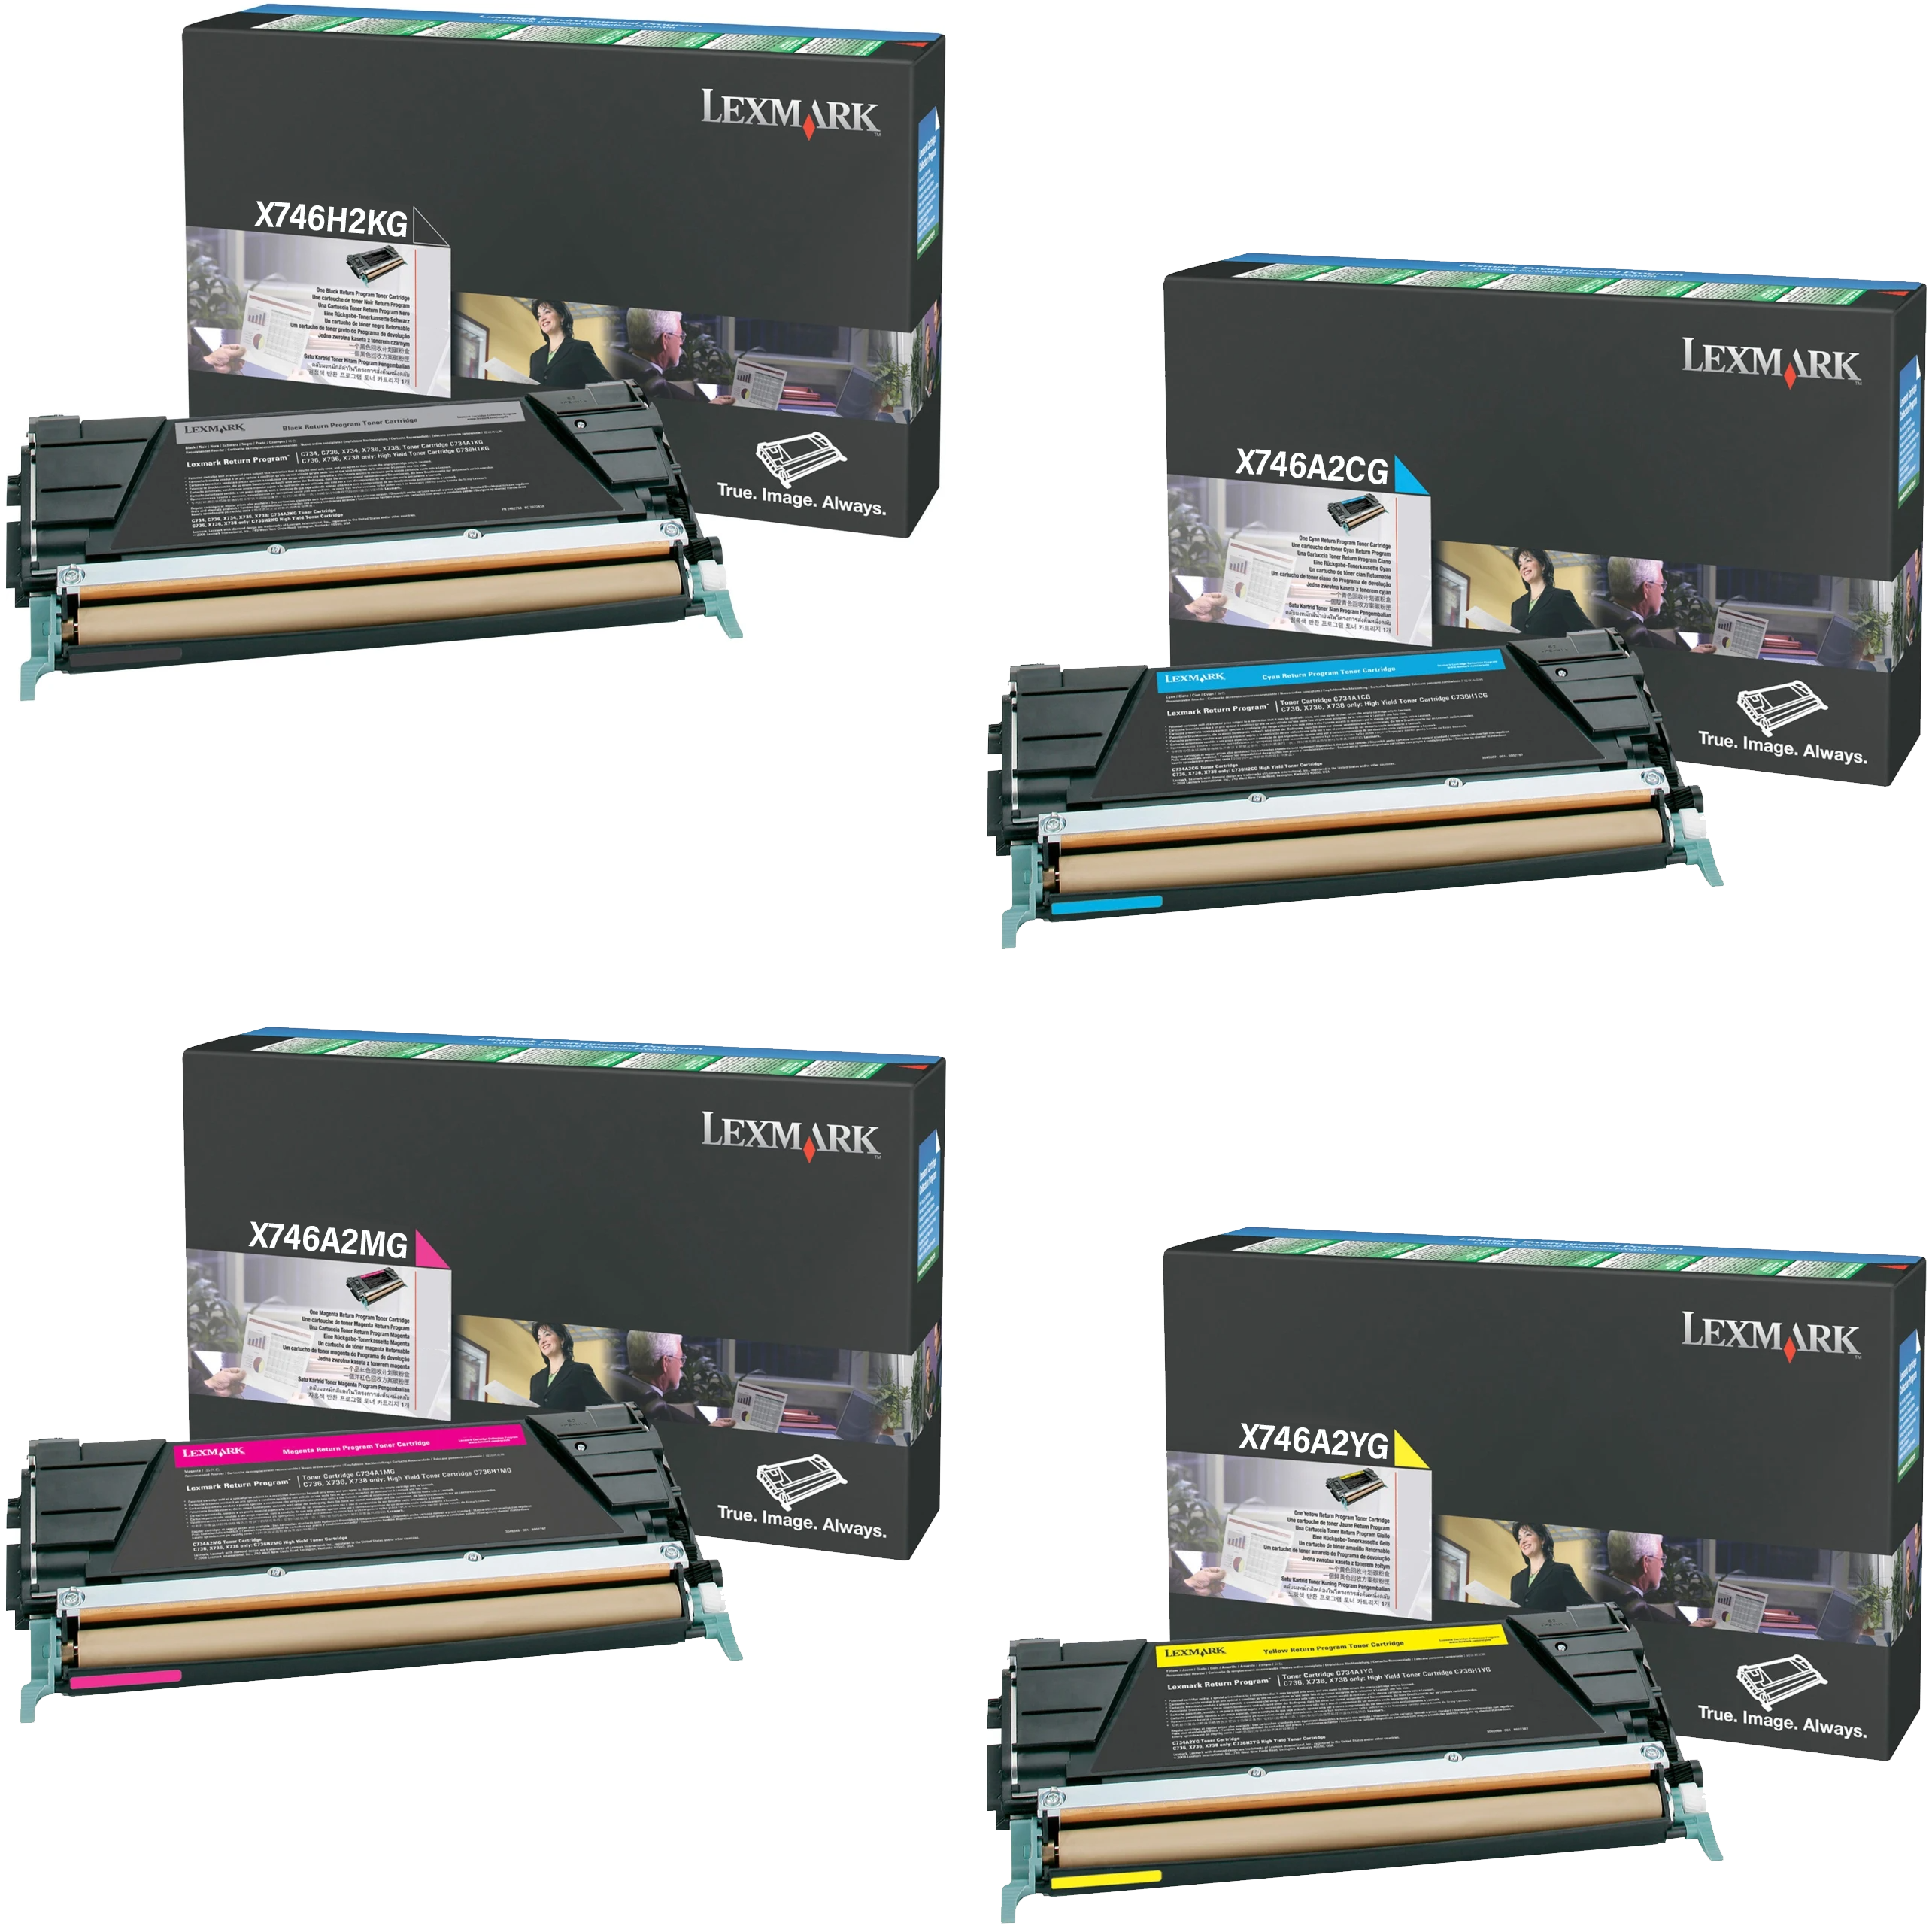 Lexmark X746A2 Set   X746H2KG X746A2CG X746A2MG X746A2YG   Original Lexmark Toner Cartridges – High-Yield Black, Cyan, Magenta, Yellow